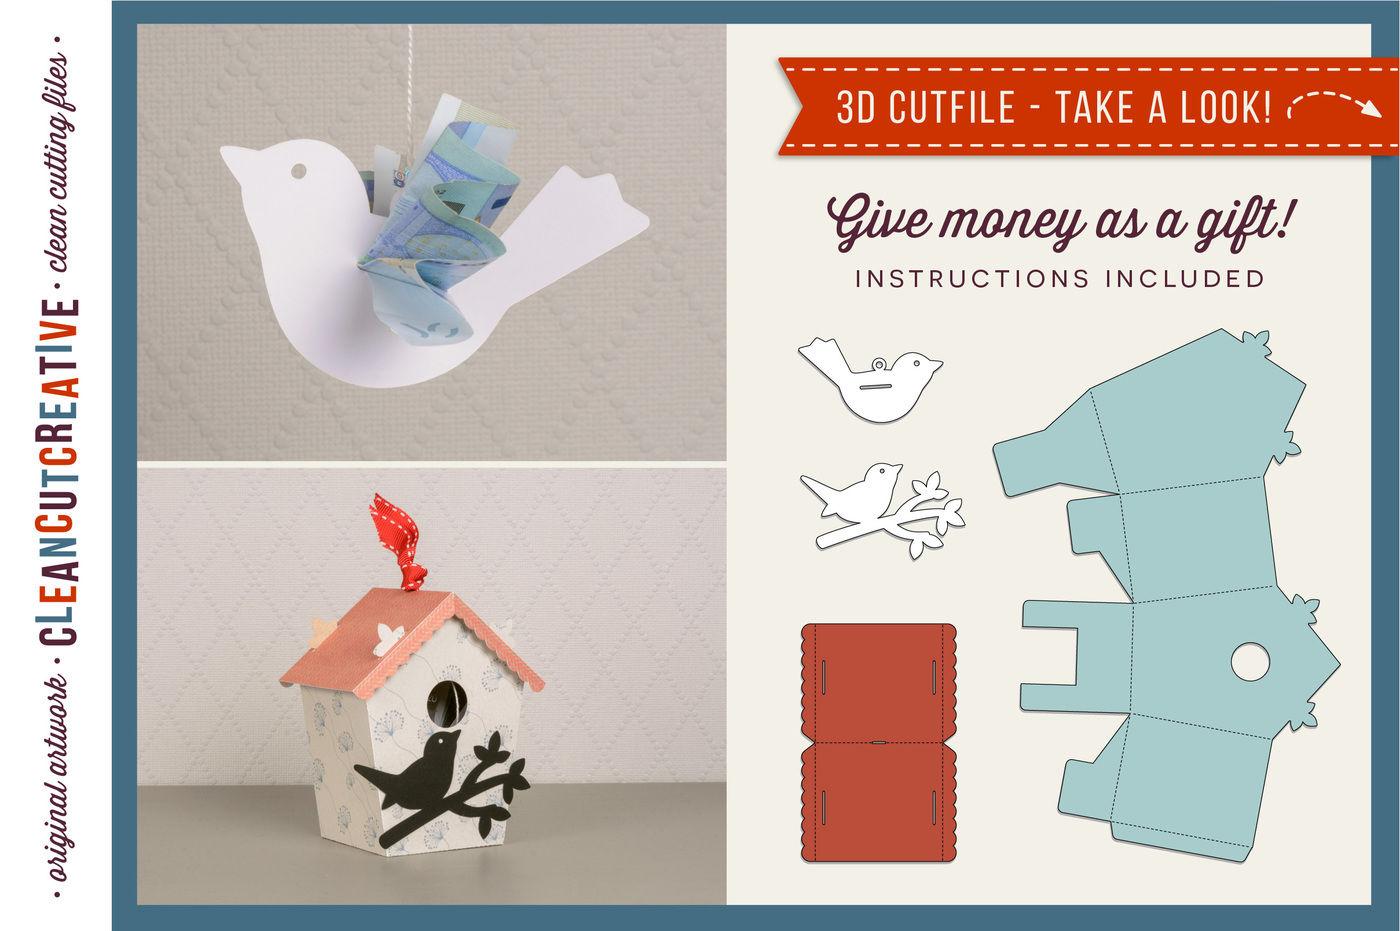 Give money - Cash gift - Money Bird & Birdhouse 3D craft